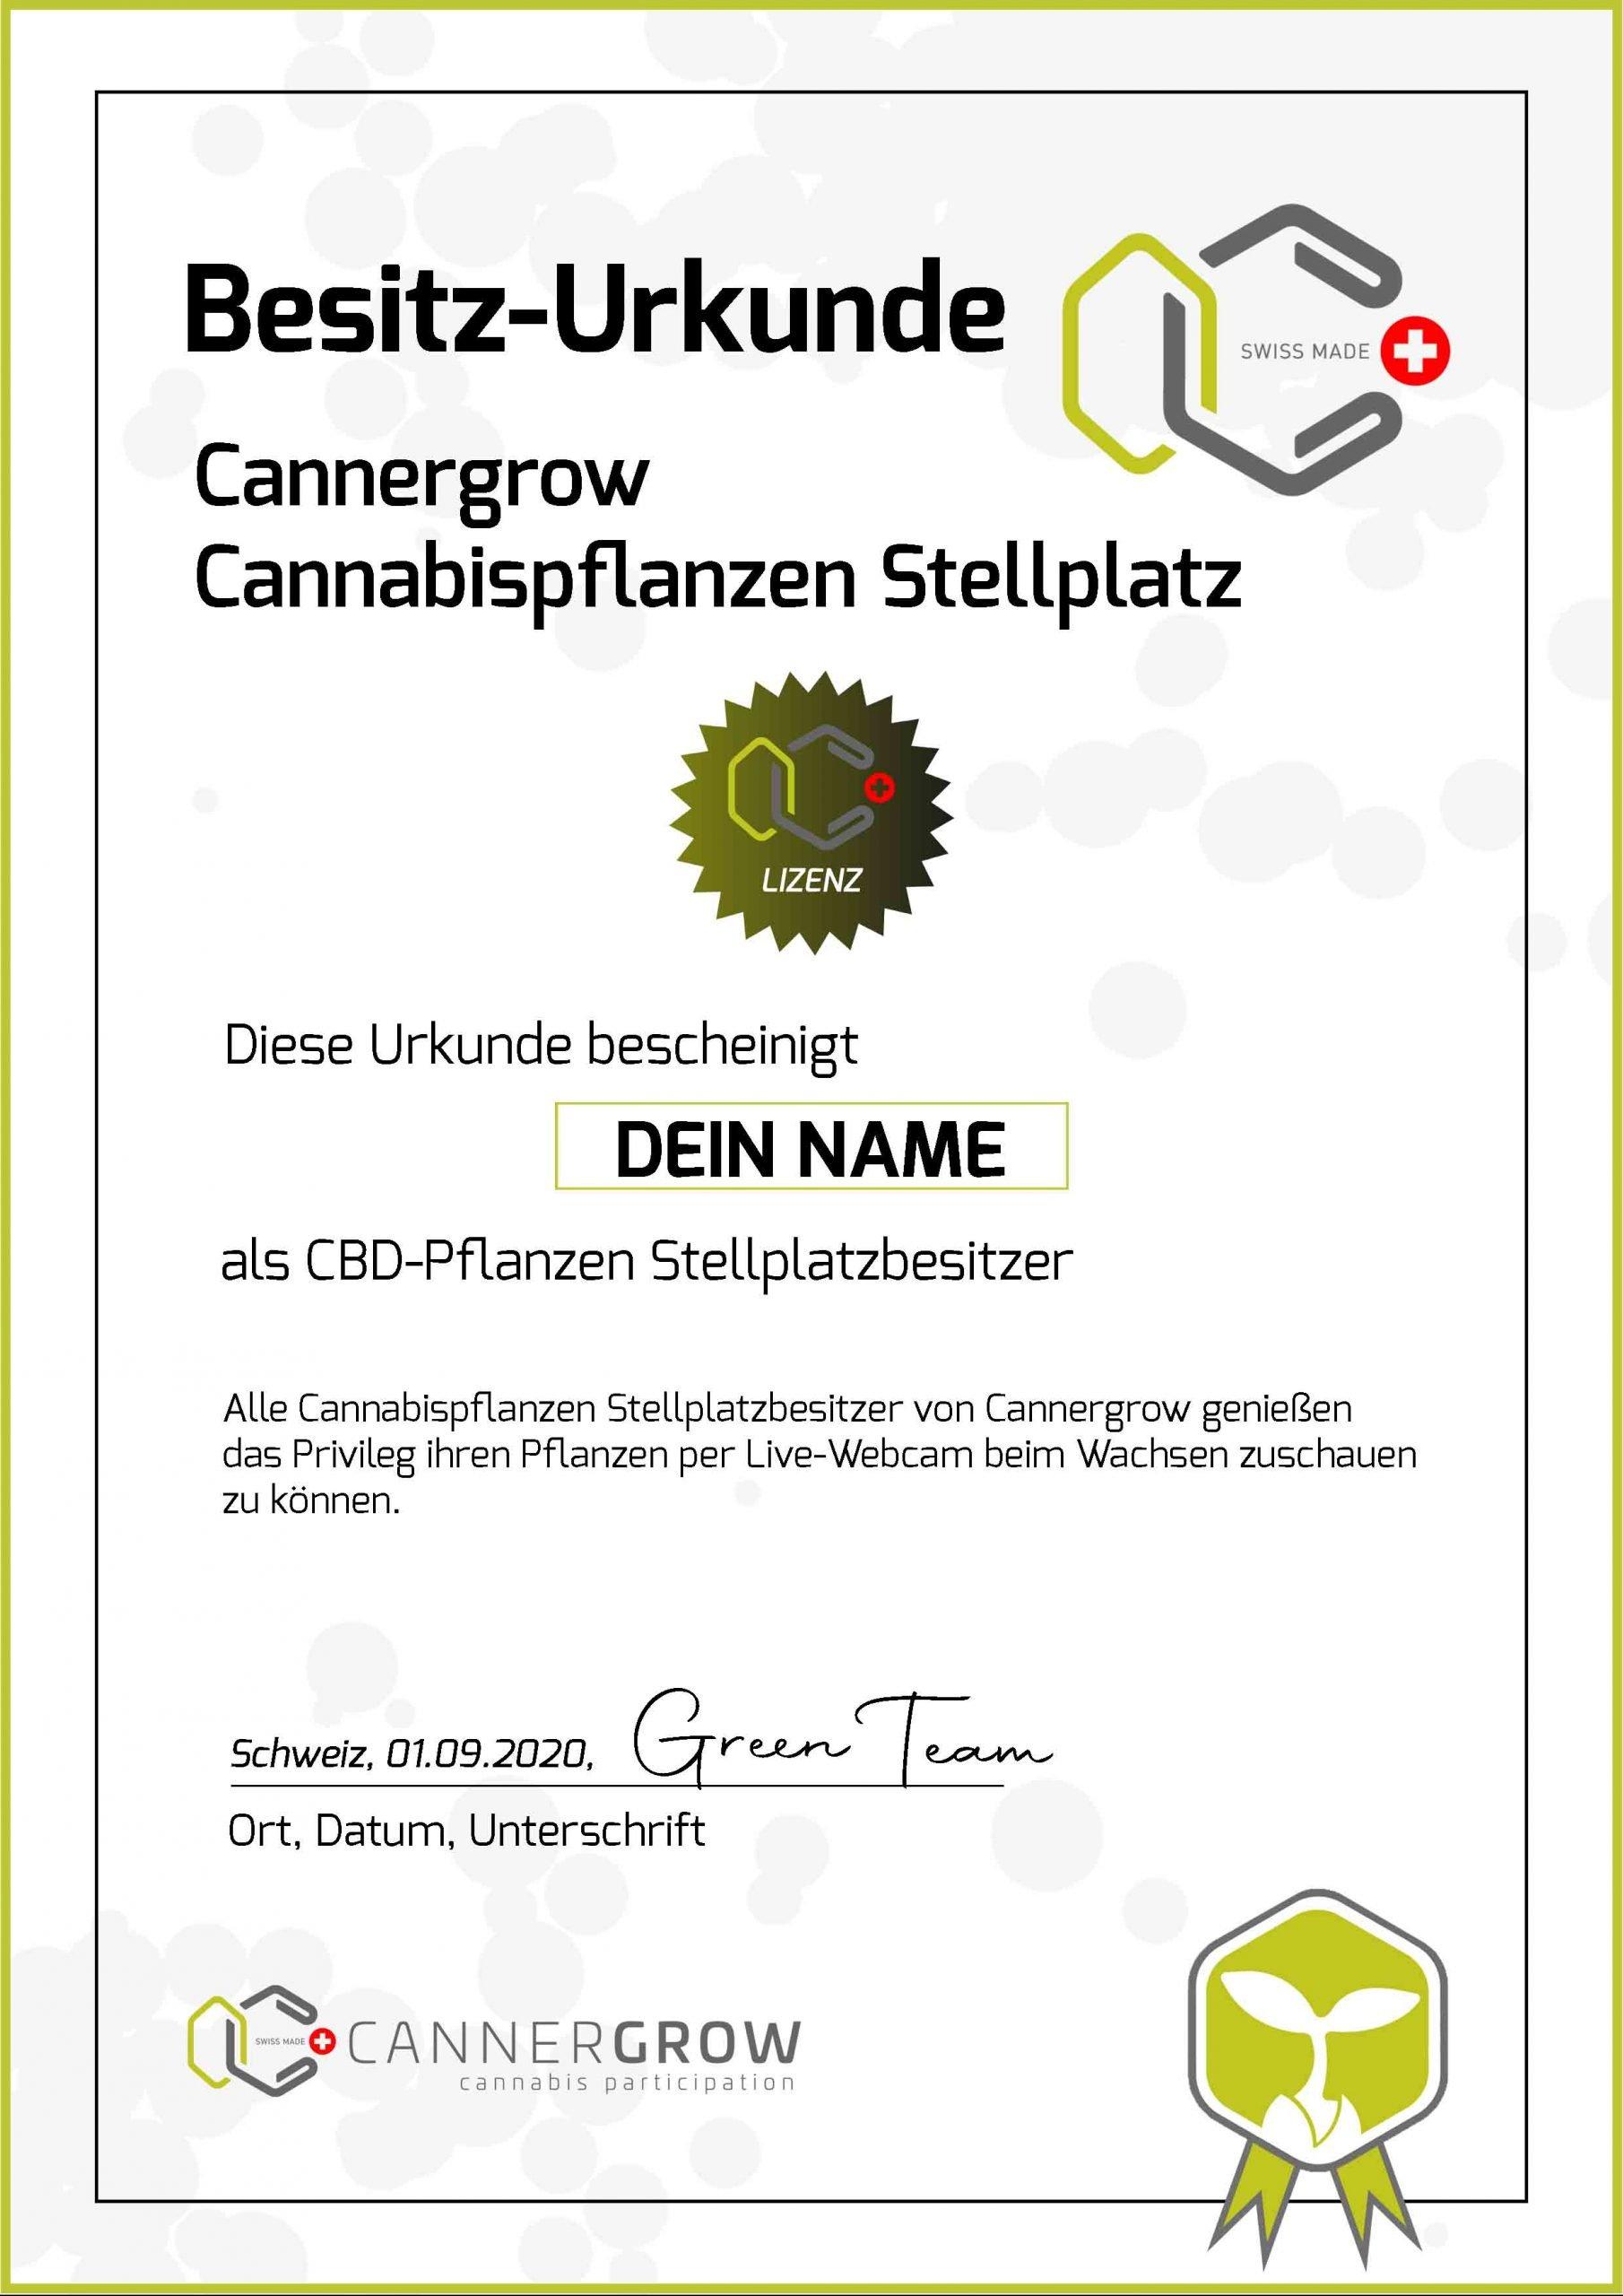 Cannergrow Besitz Urkunde in 2D